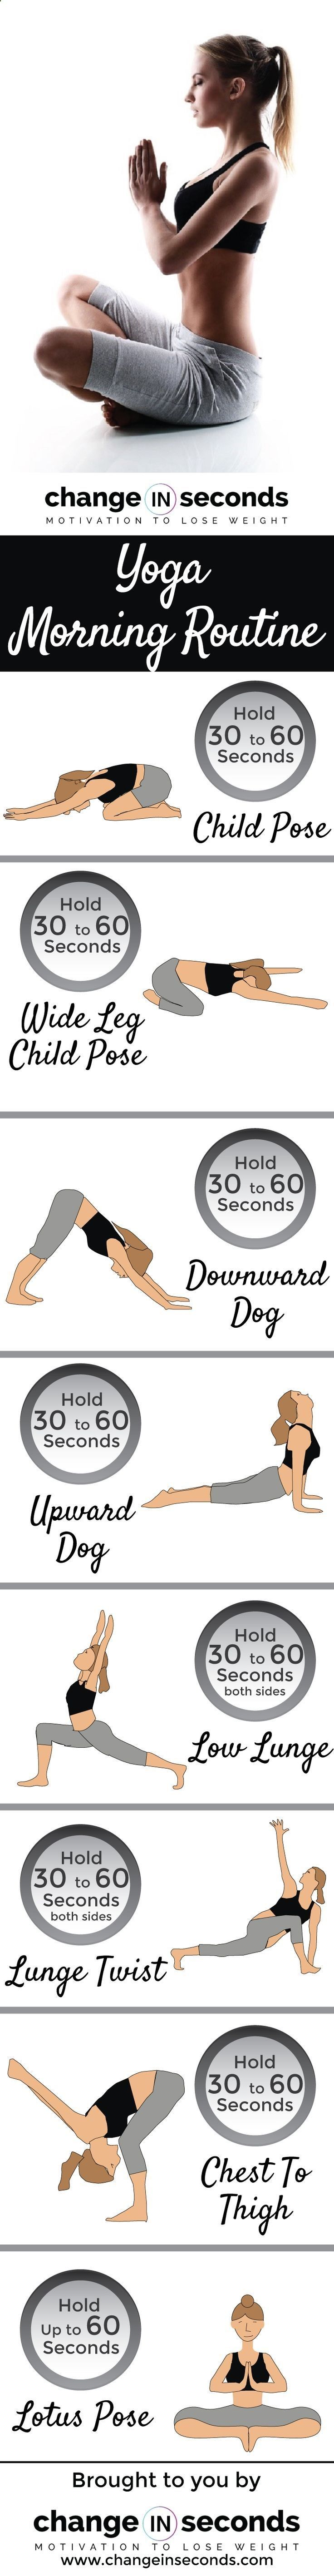 Easy Yoga Workout - Fitness Motivation : Yoga Morning ...